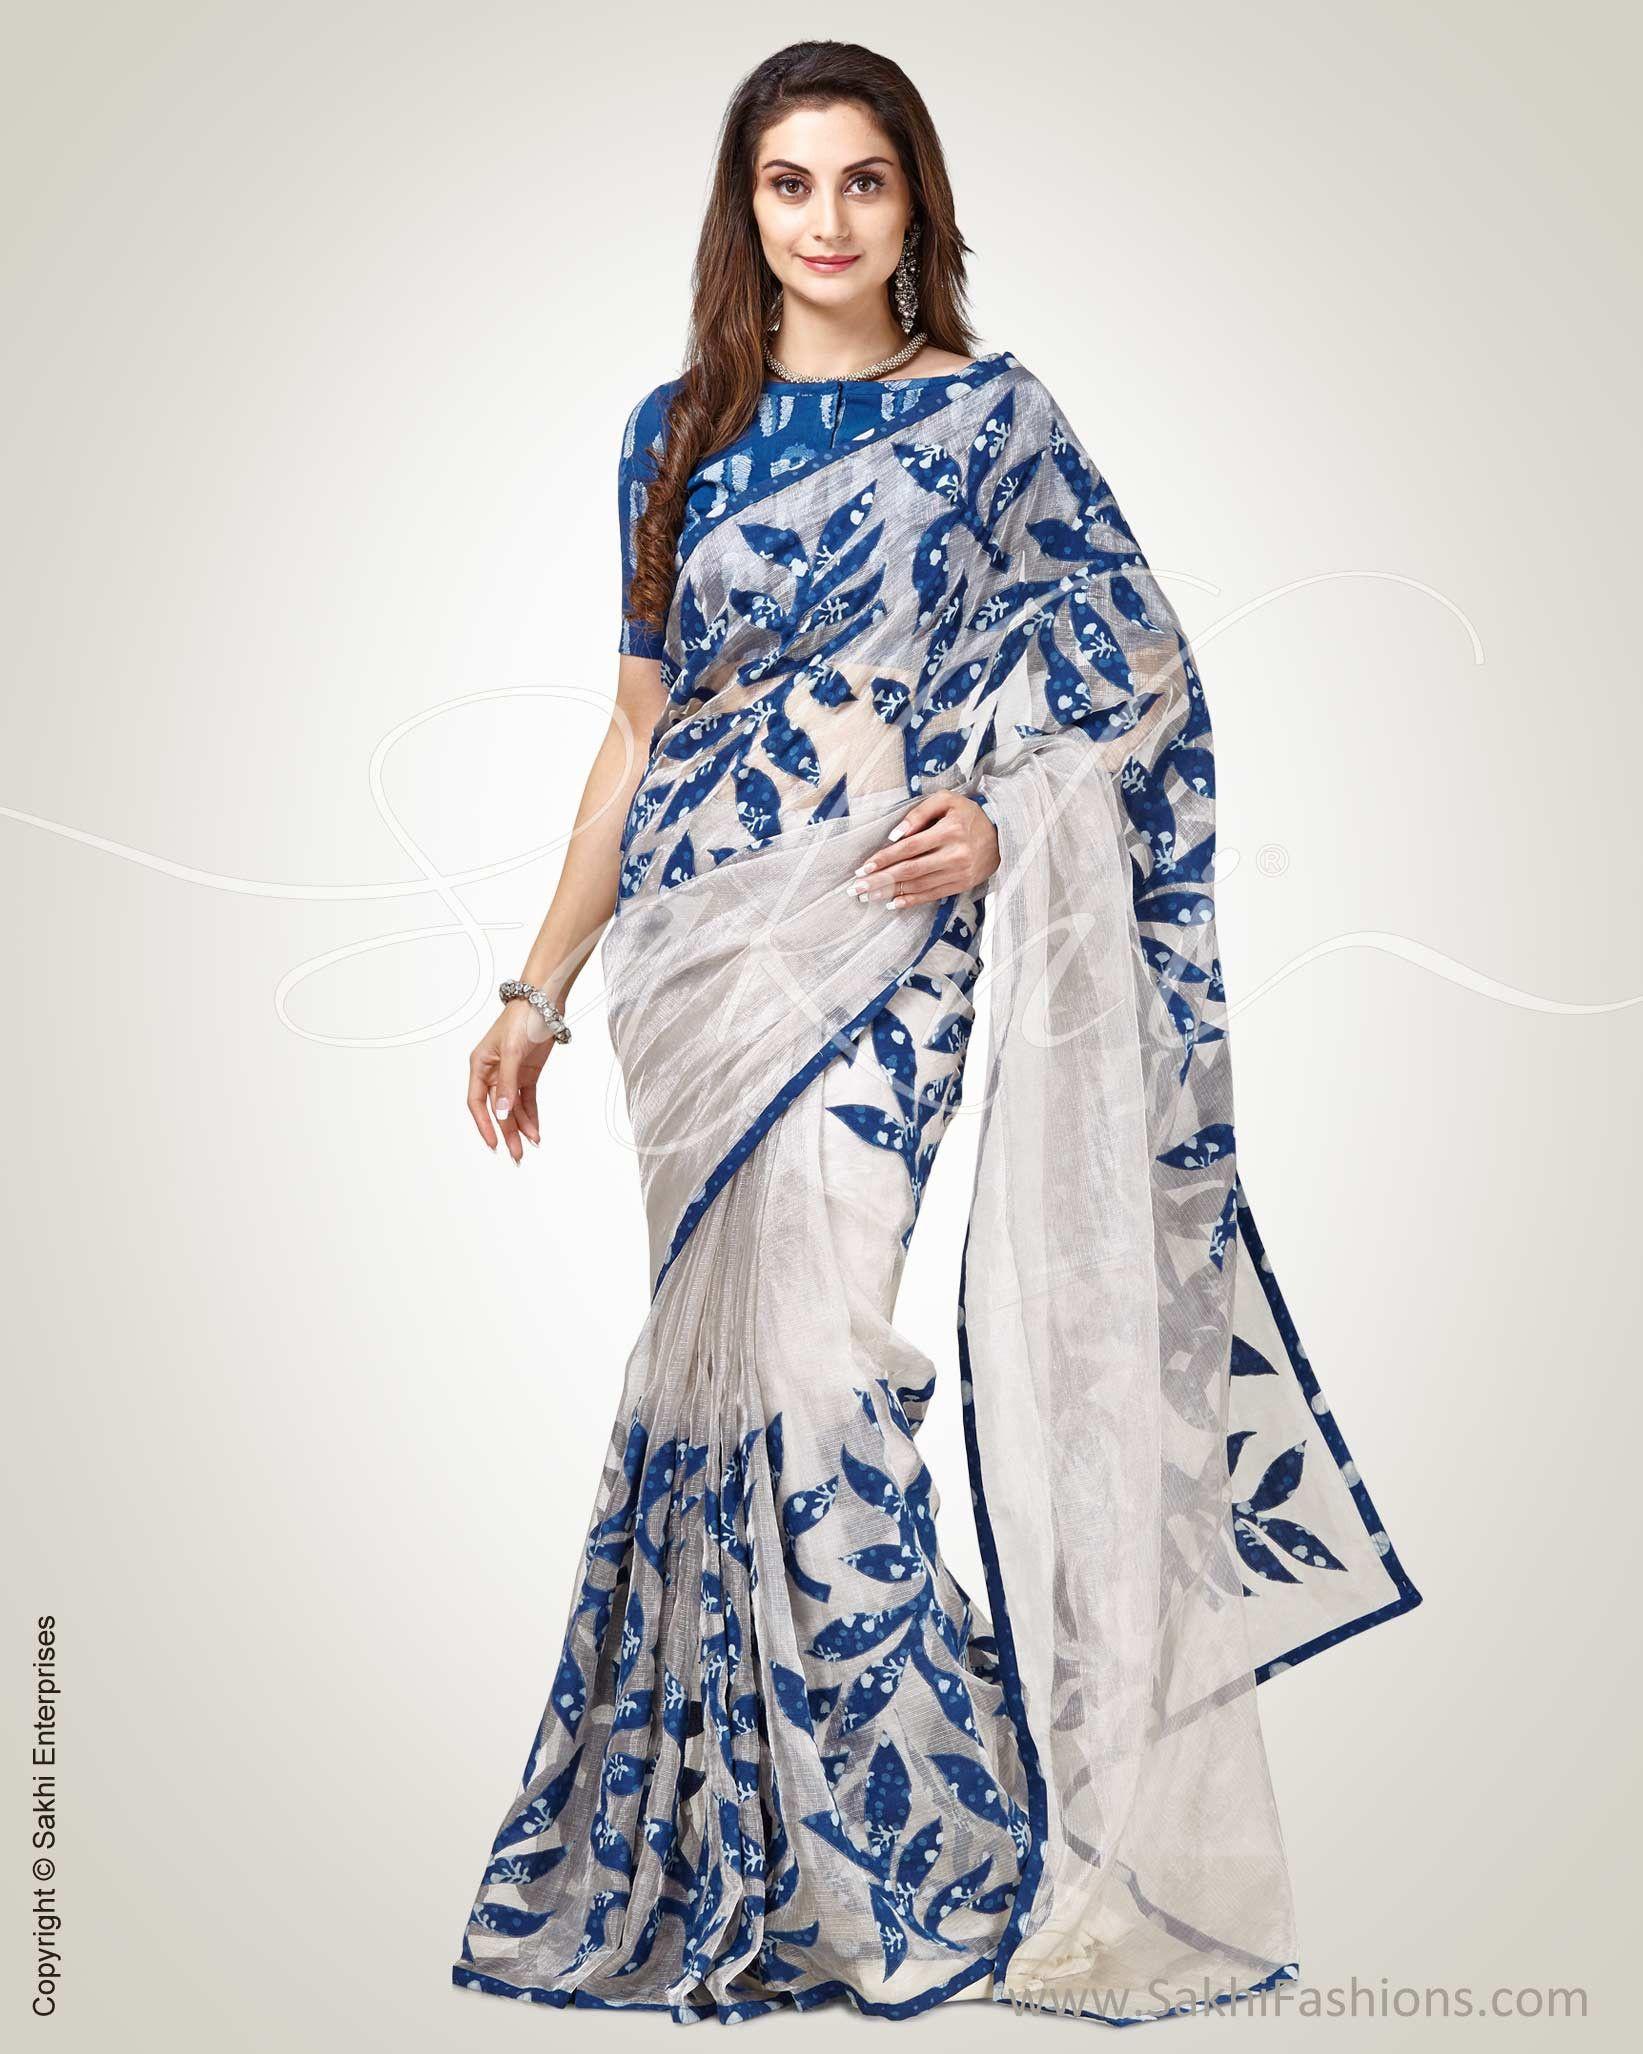 f0f1fc6b20 Look stylish in this Silver & Blue Pure Tissue Kota Saree designed with  kalamkari applique work on body and pallu #design #blue #tissue #saree  #fashion # ...